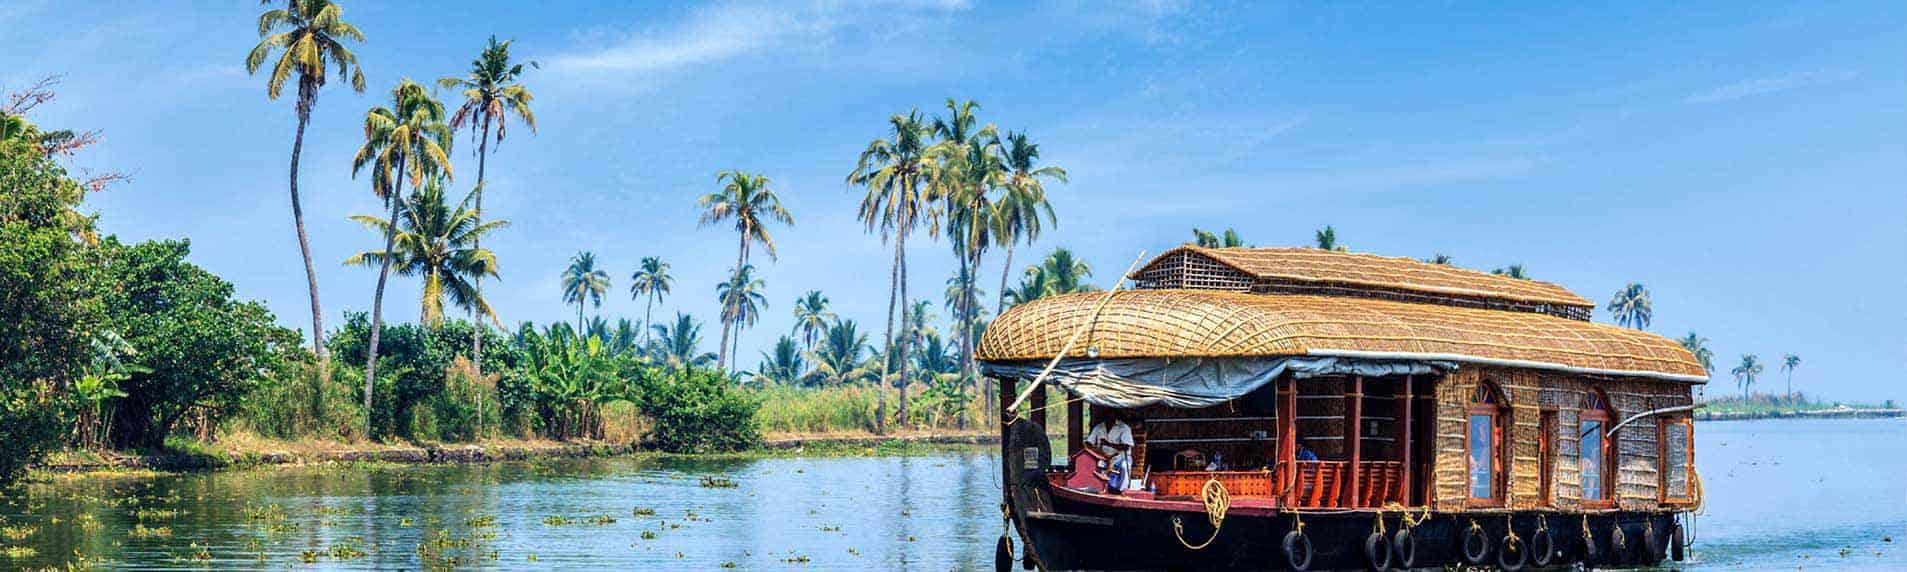 Magical Kerala Break Package